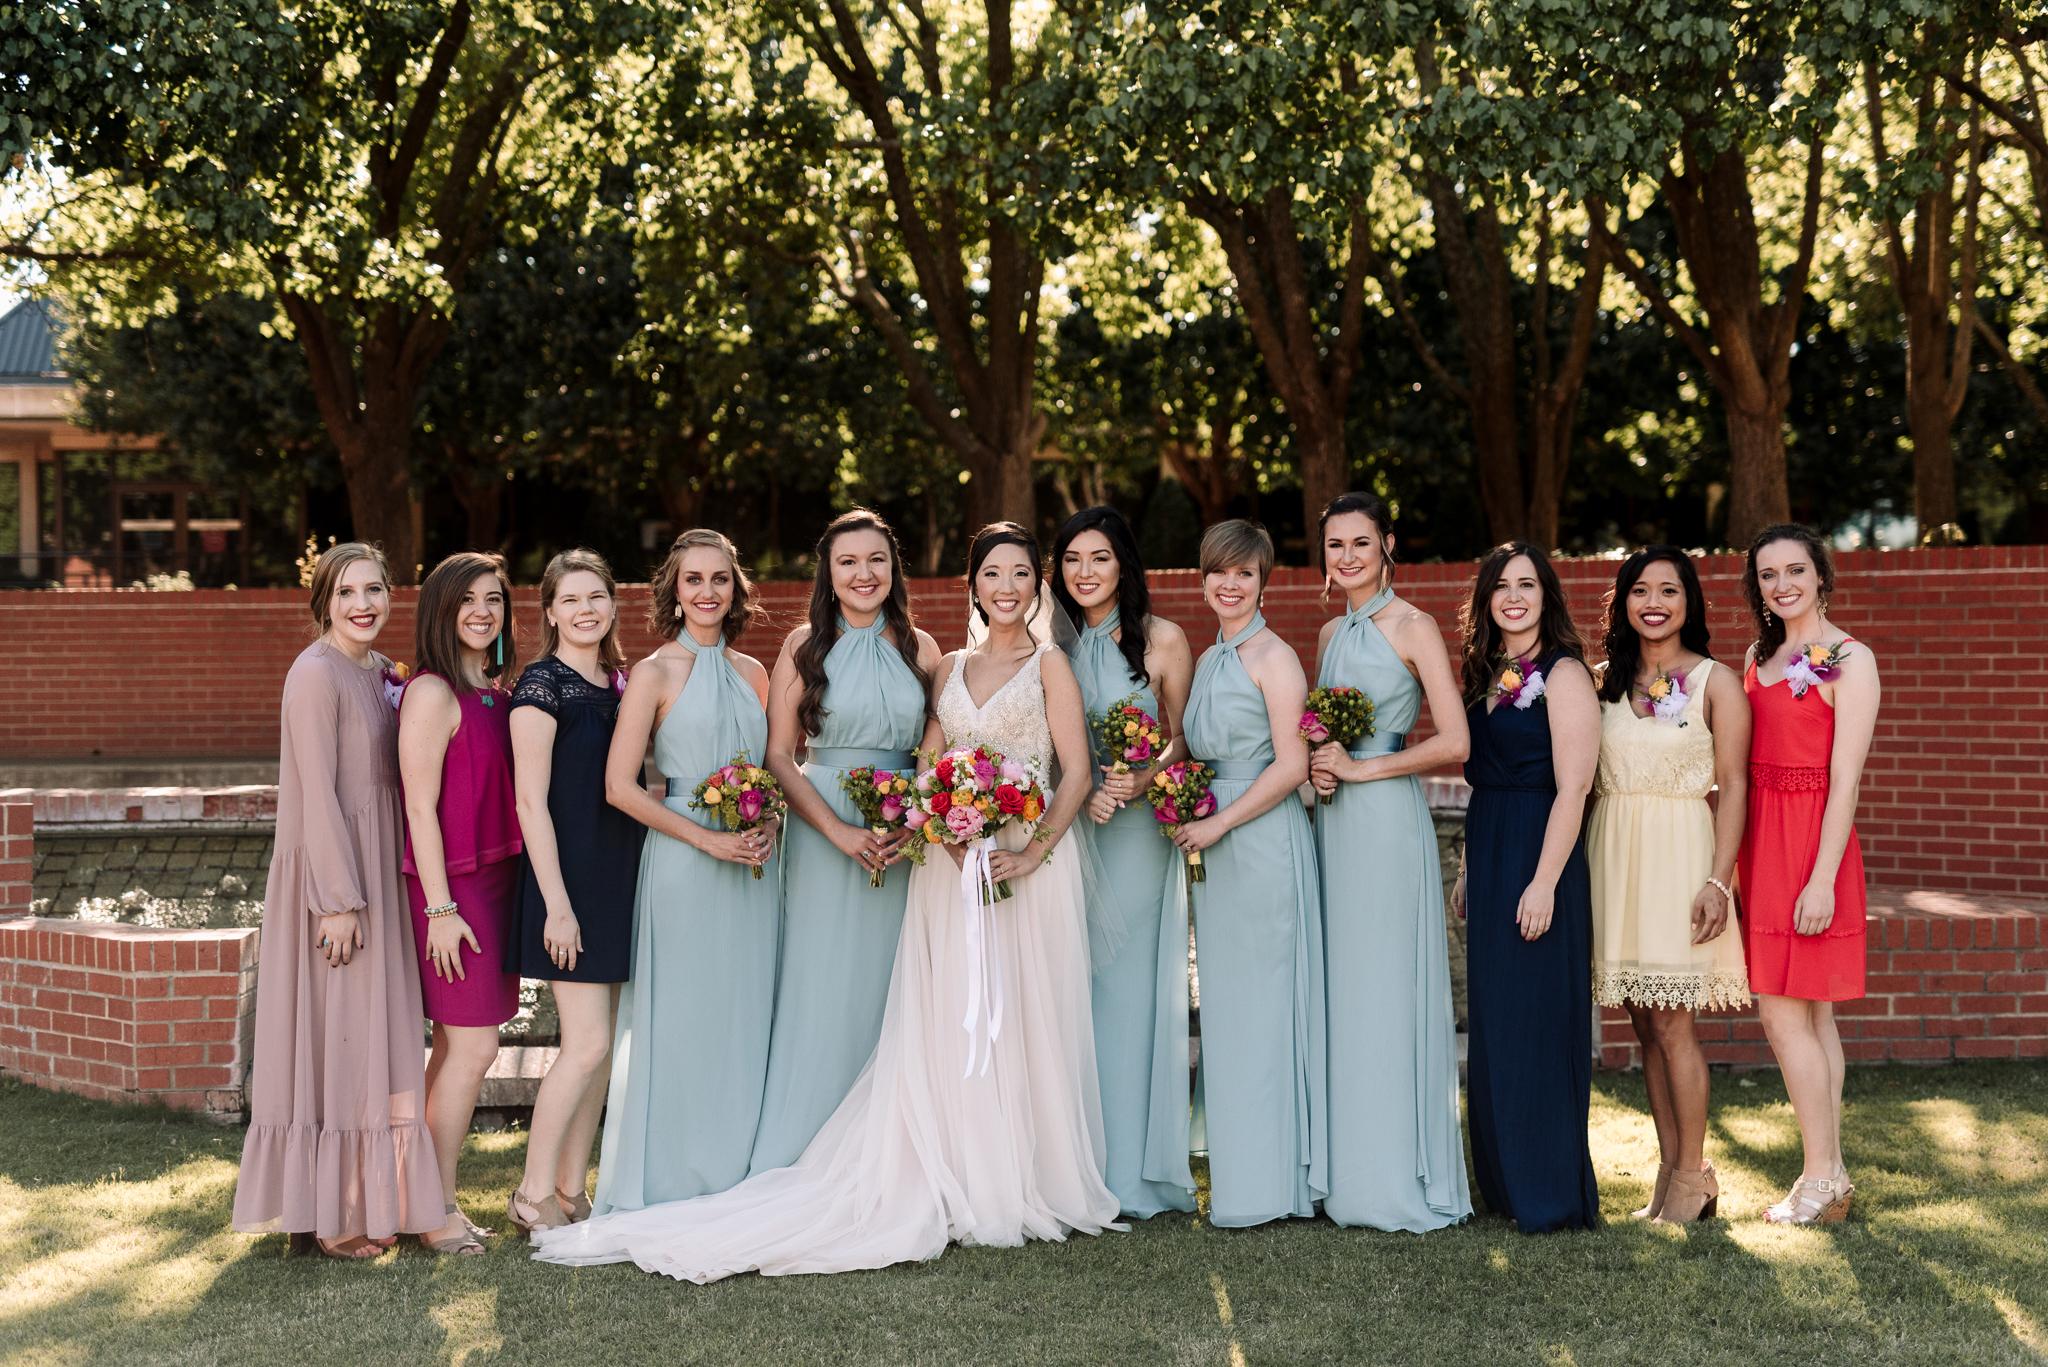 Oklahoma-Christian-University-Wedding-7833.jpg